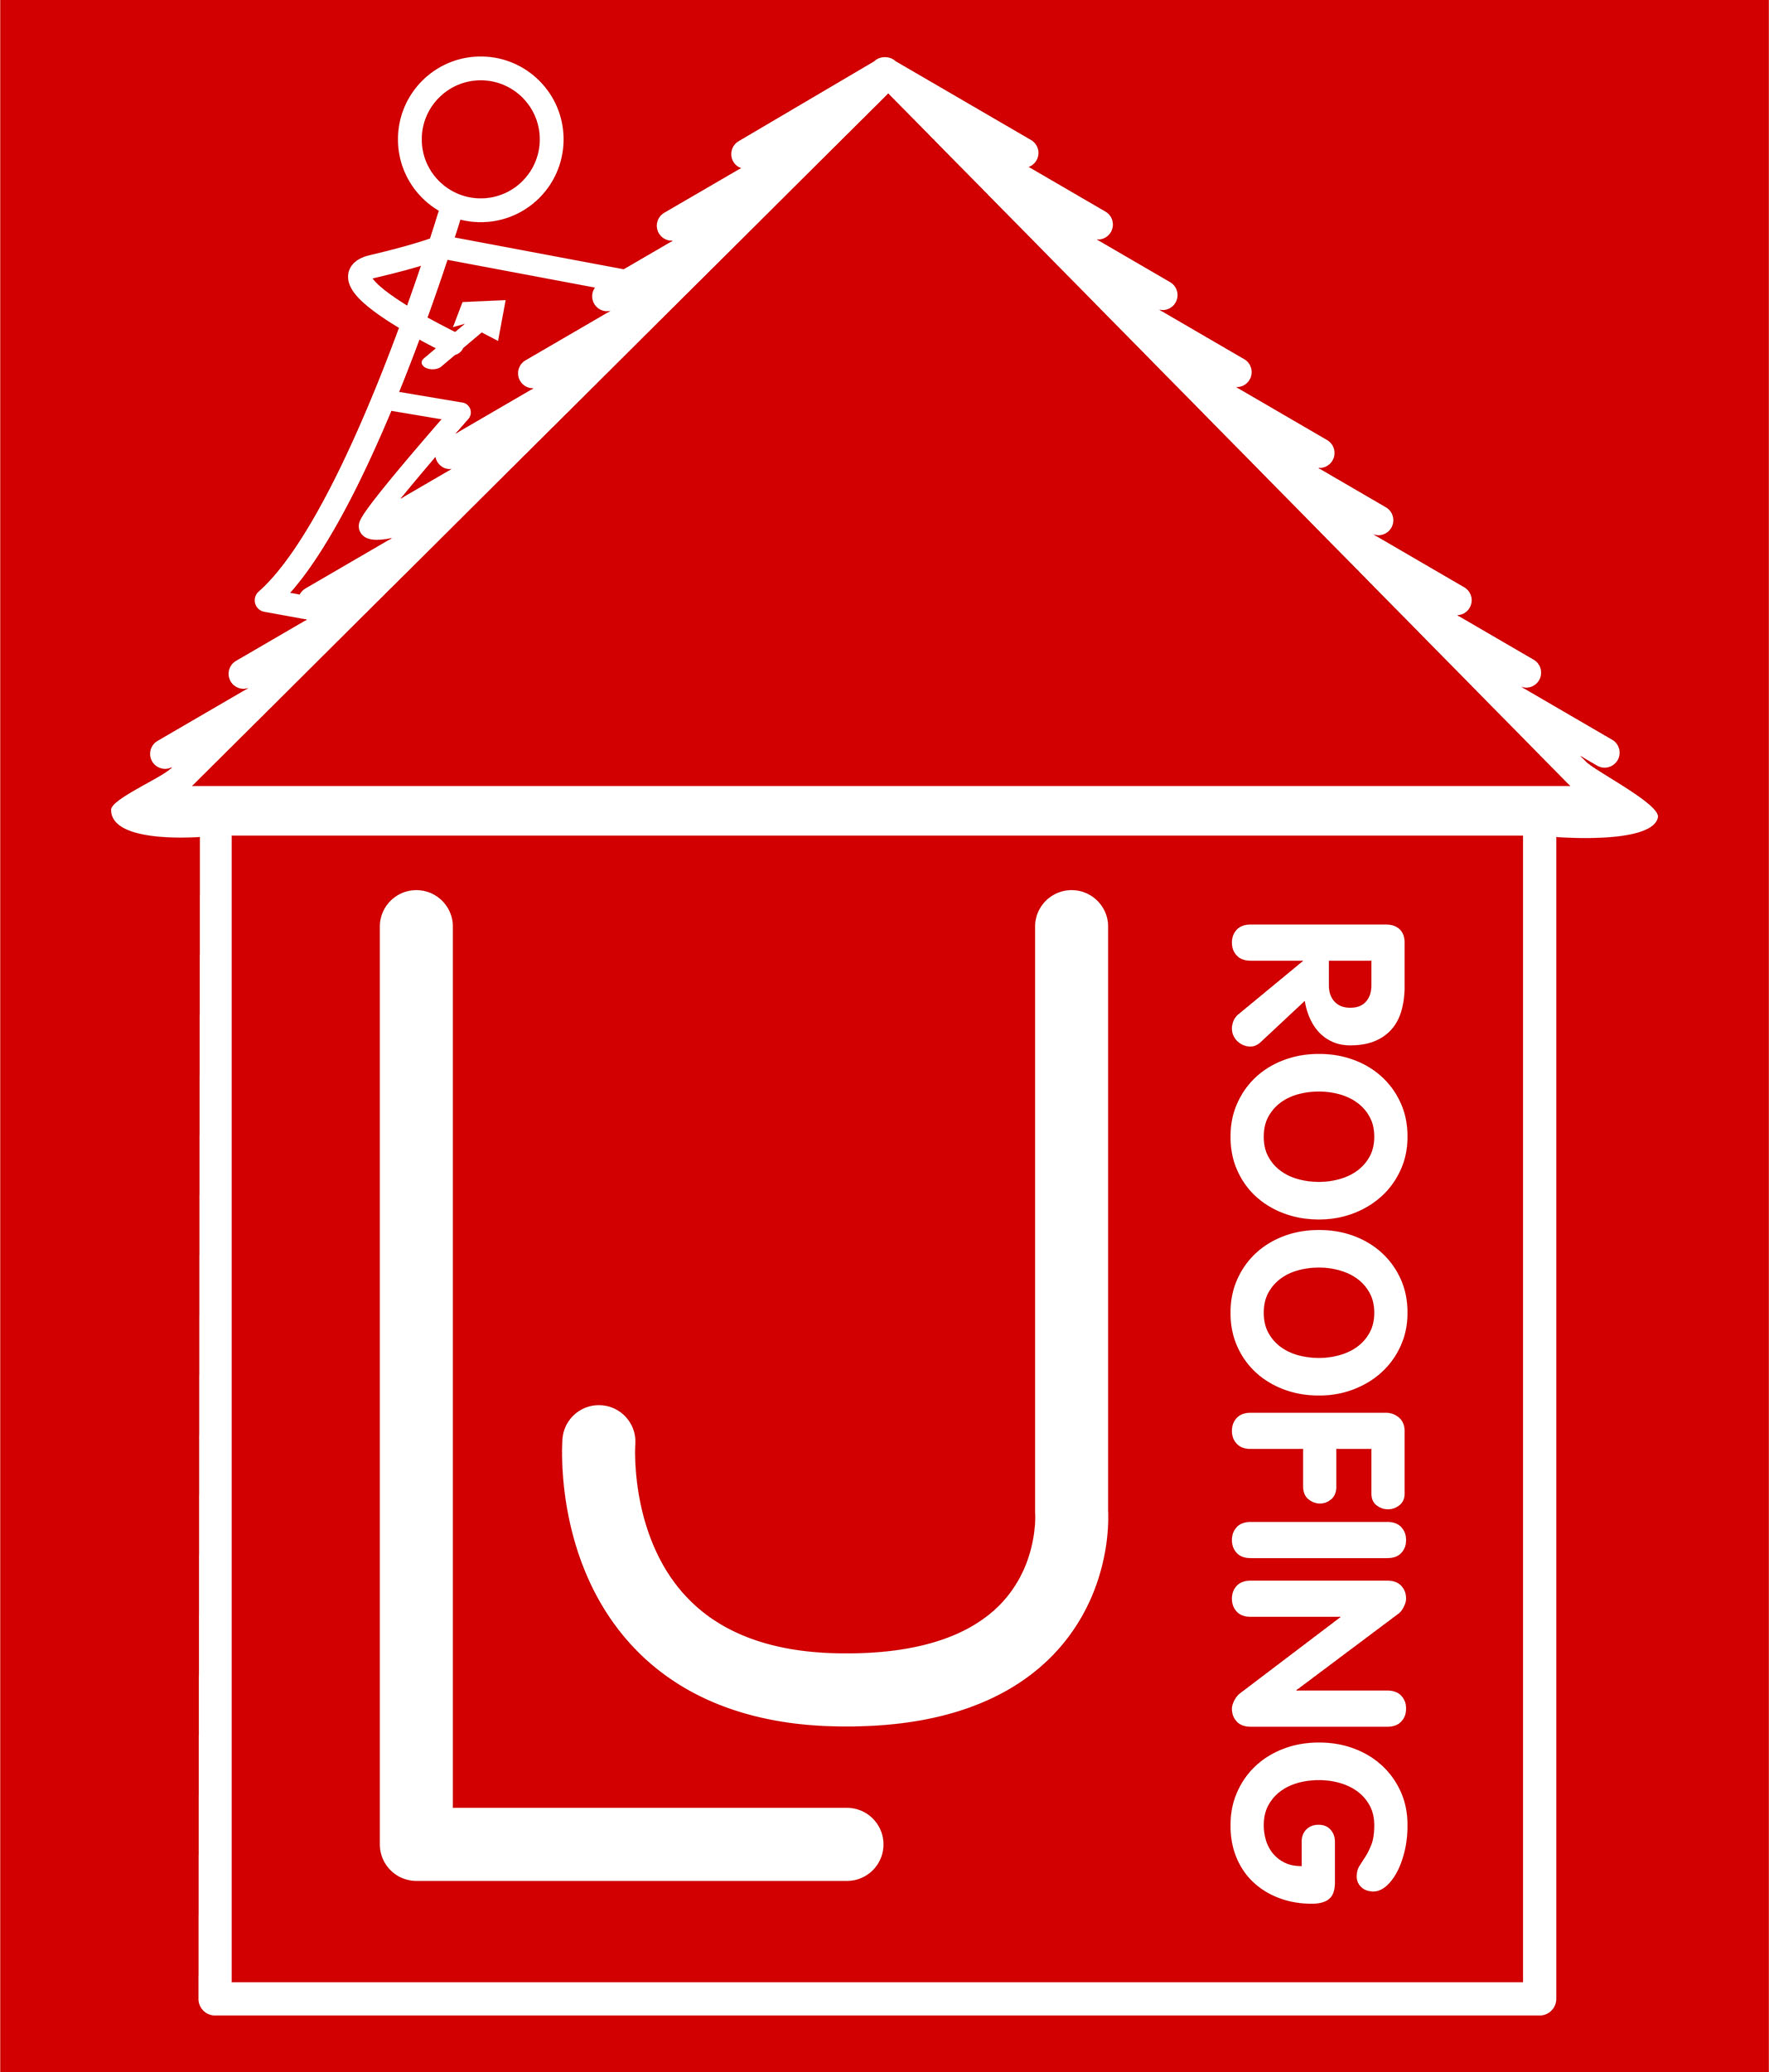 Lee Johnson Roofing